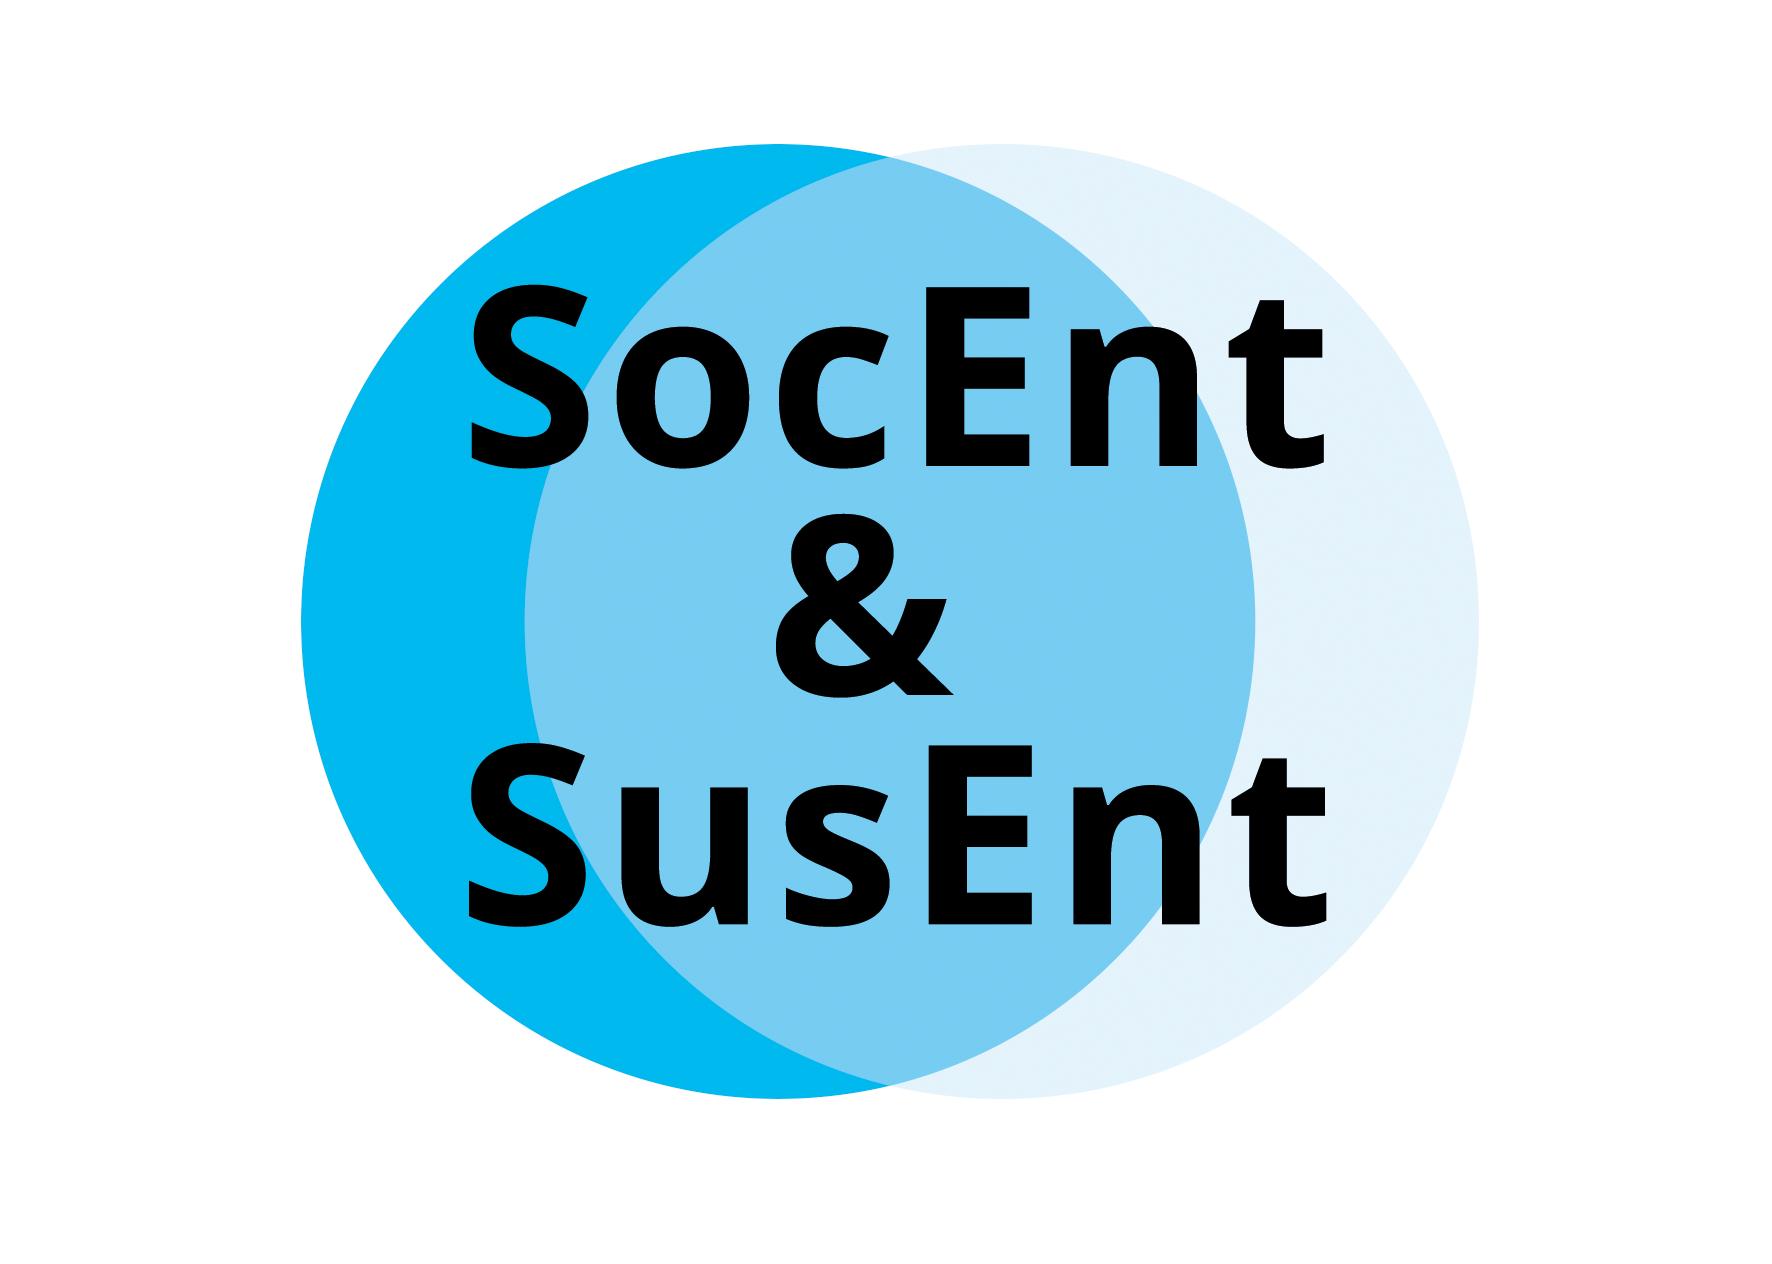 Verhältnis Sustainable Entrepreneurship und Social Entrepreneurship